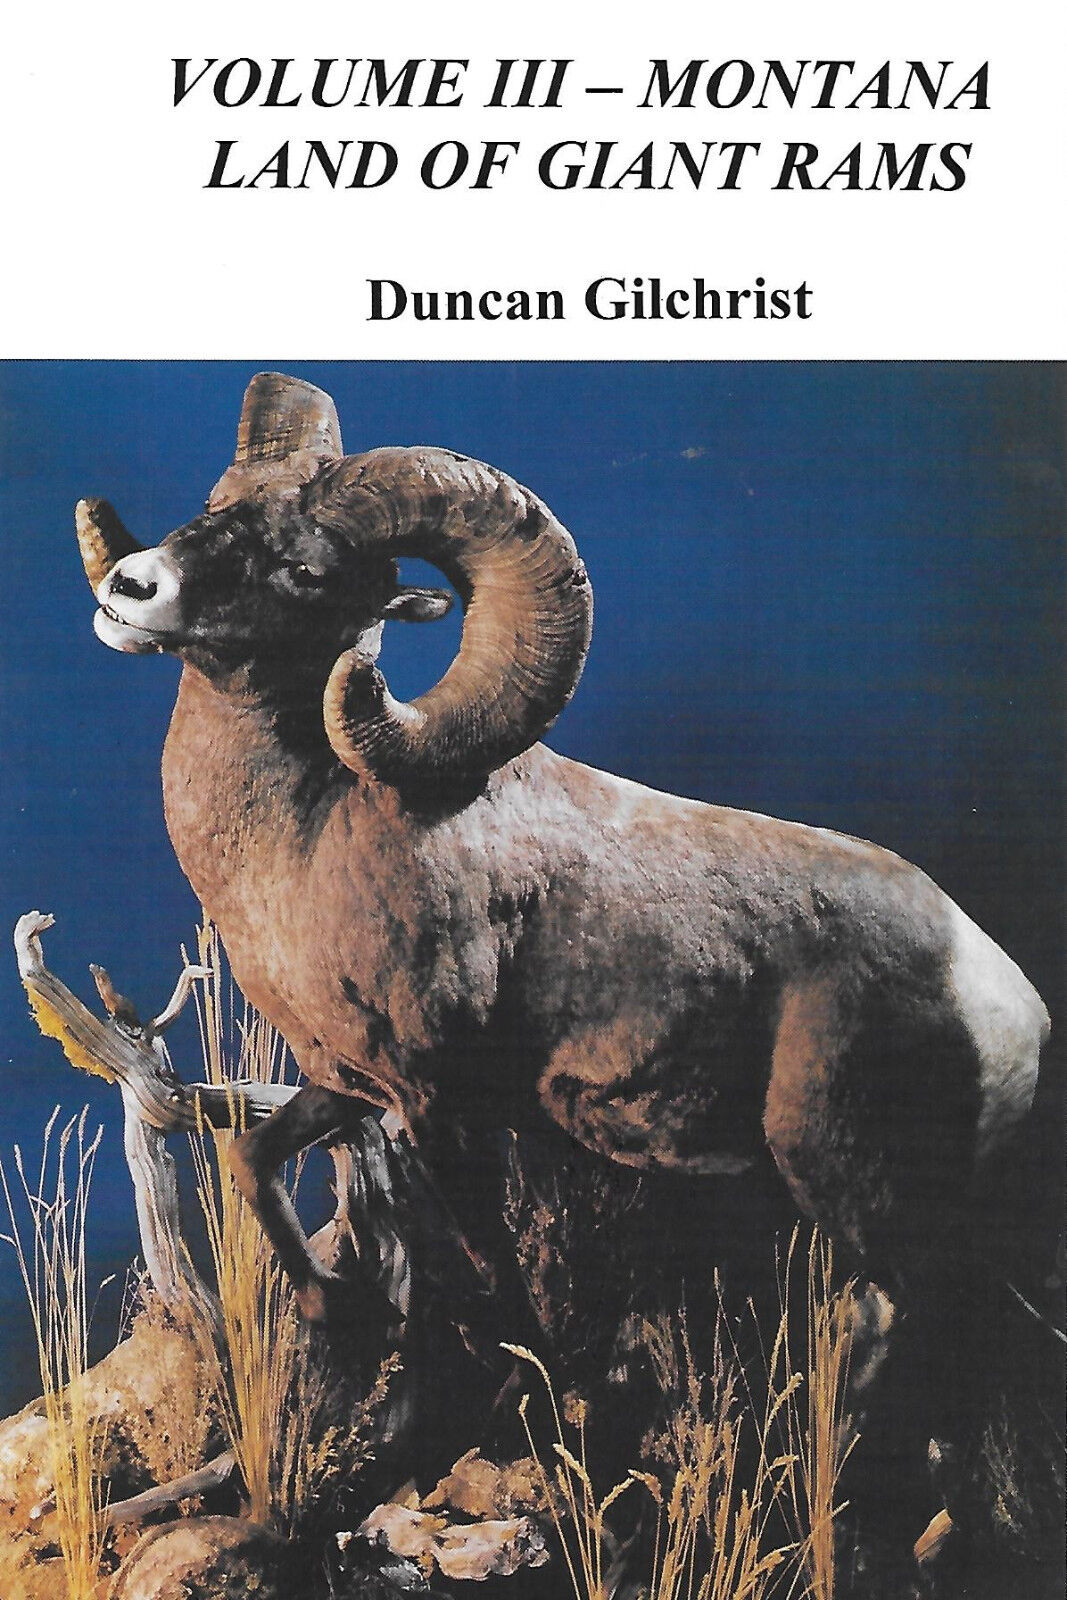 Montana tierra de gigante Rams-Vol III -- copia autografiada